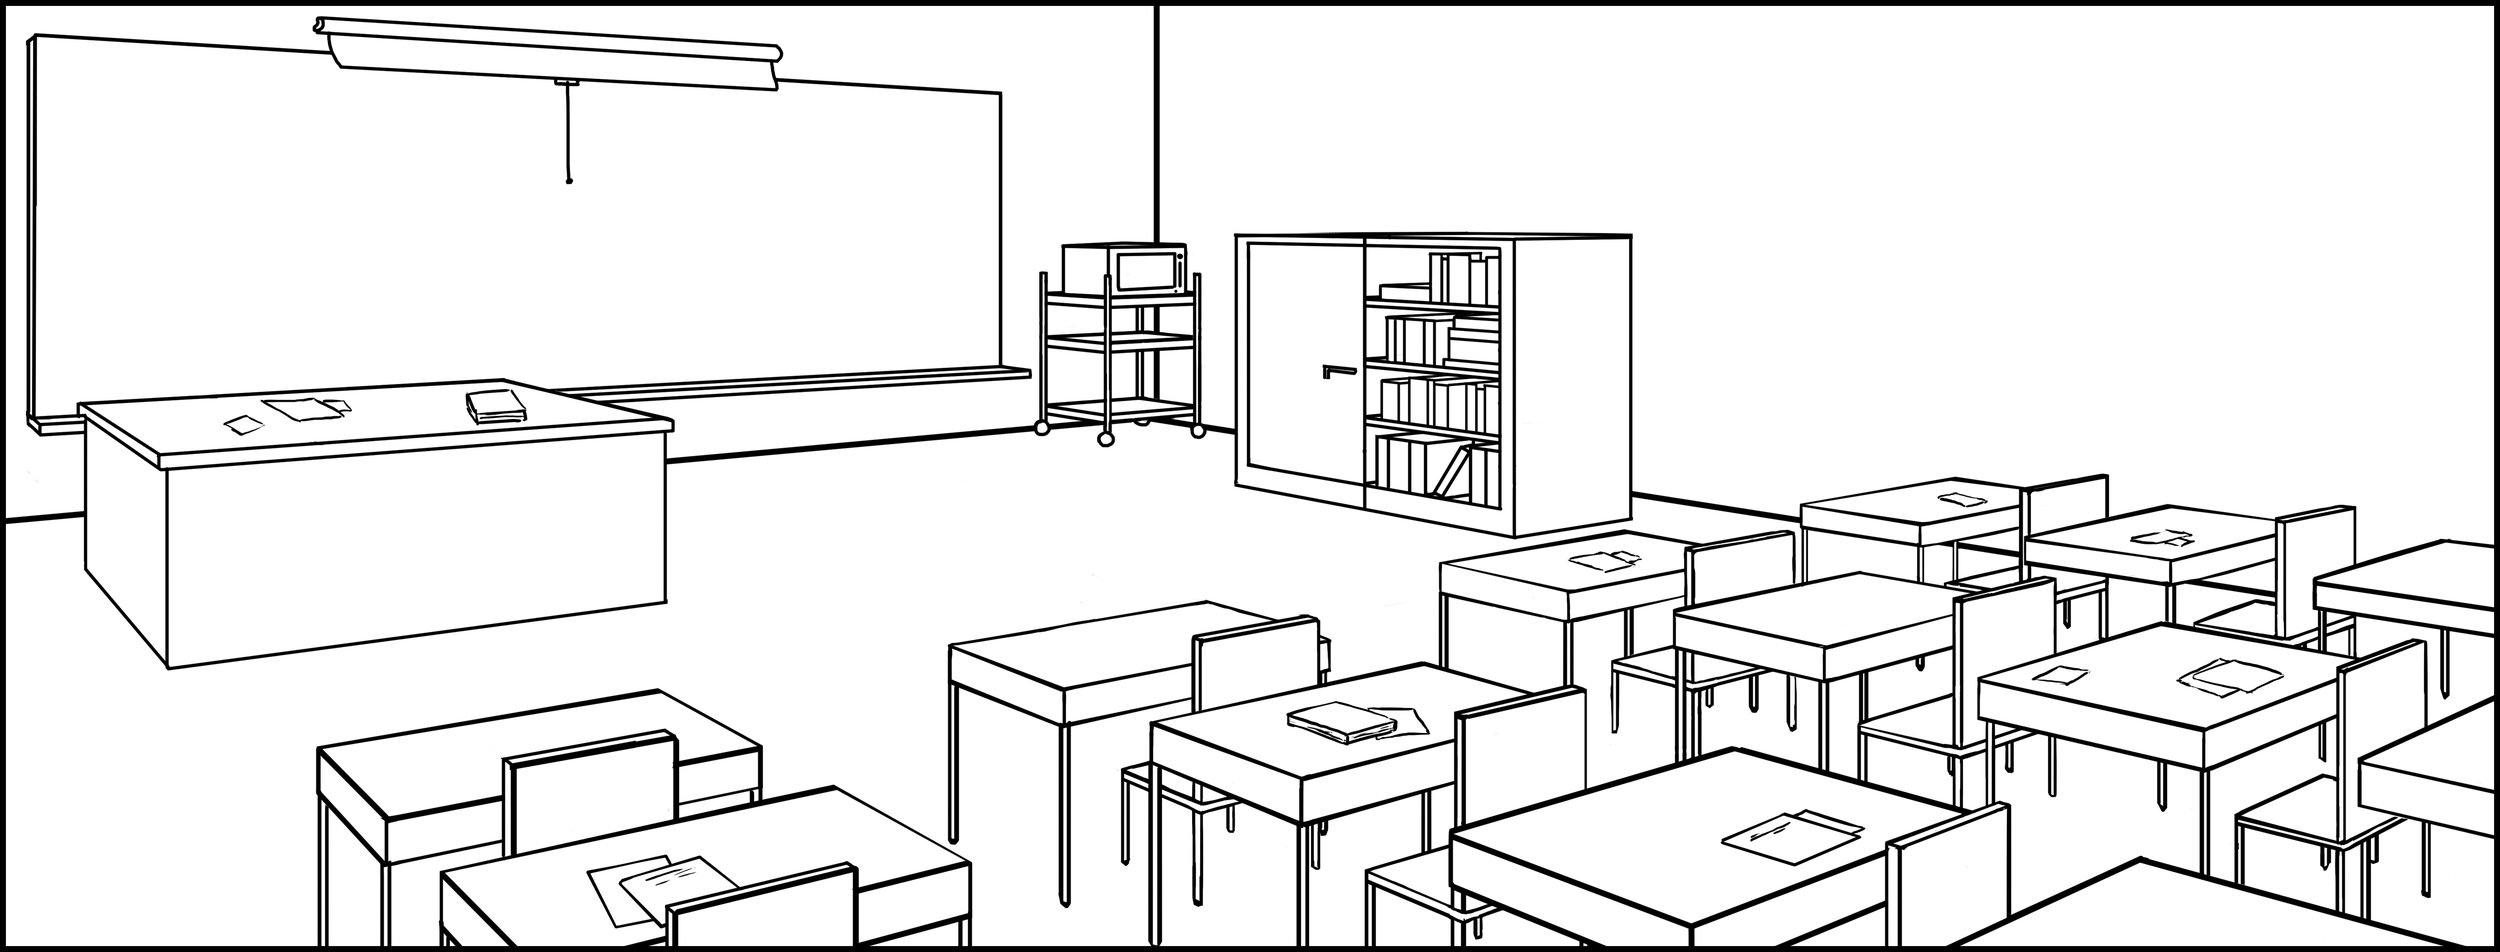 layout8.jpg